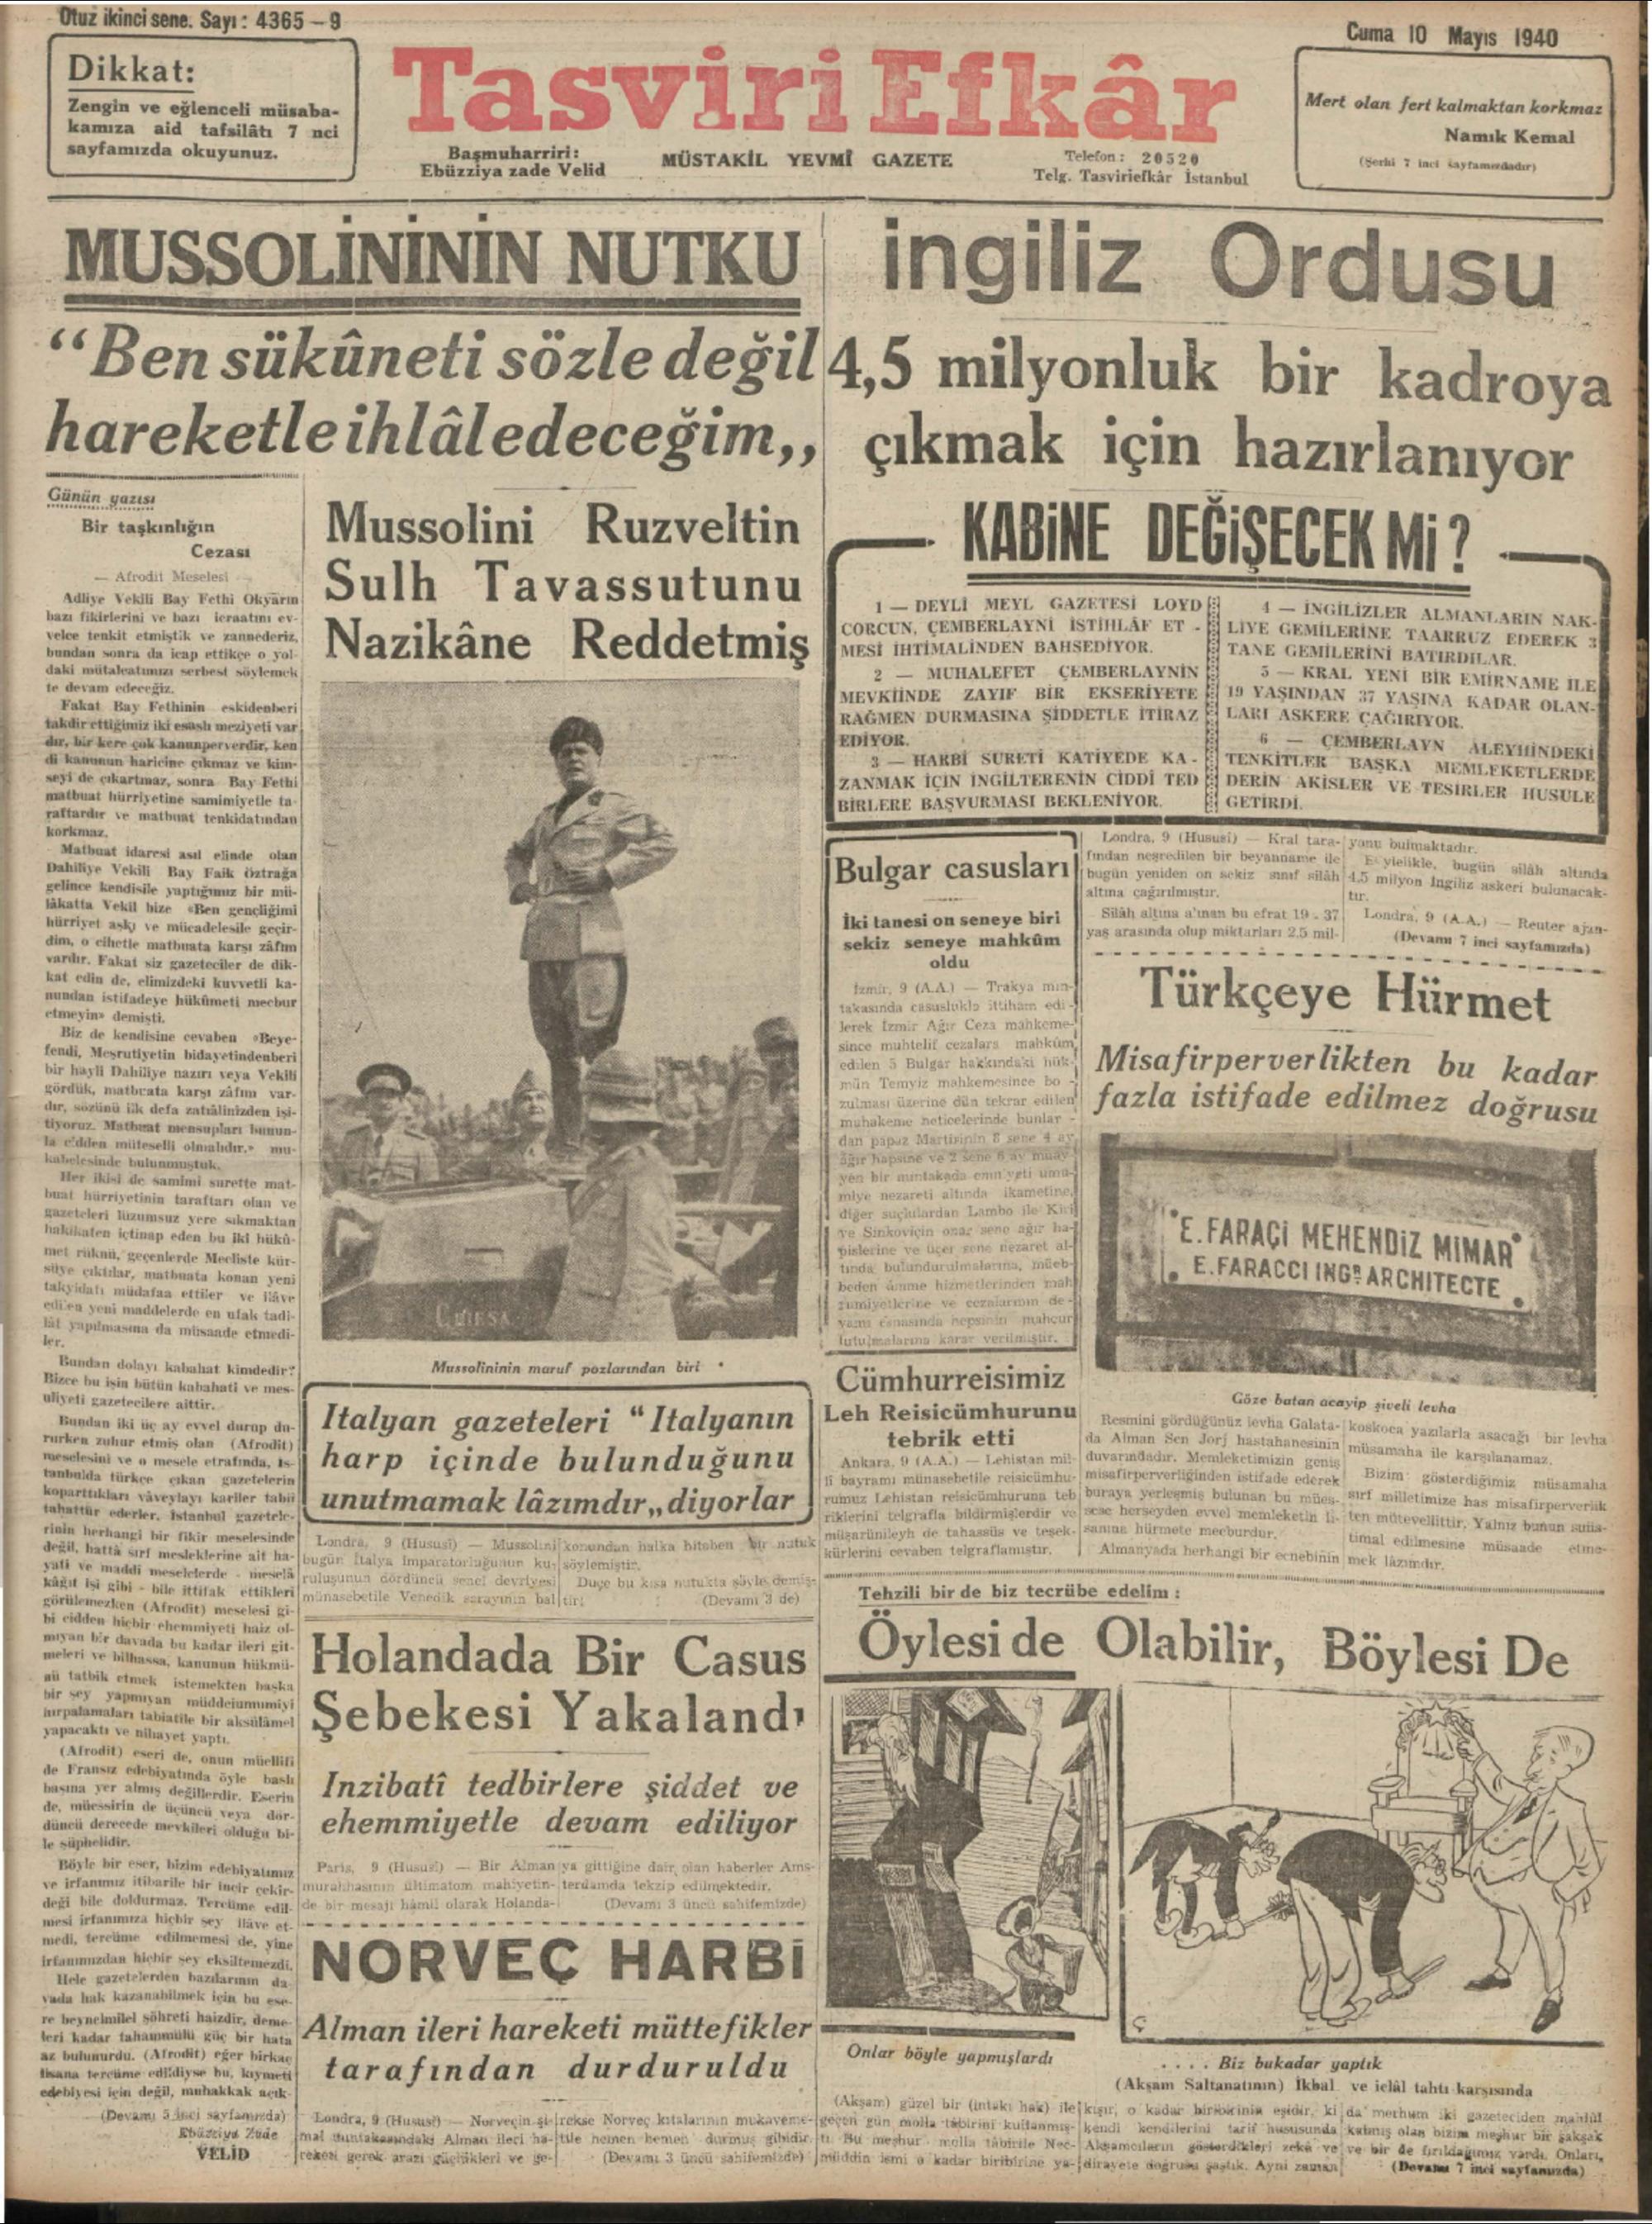 10 Mayıs 1940 Tarihli Tasviri Efkar Gazetesi Sayfa 1